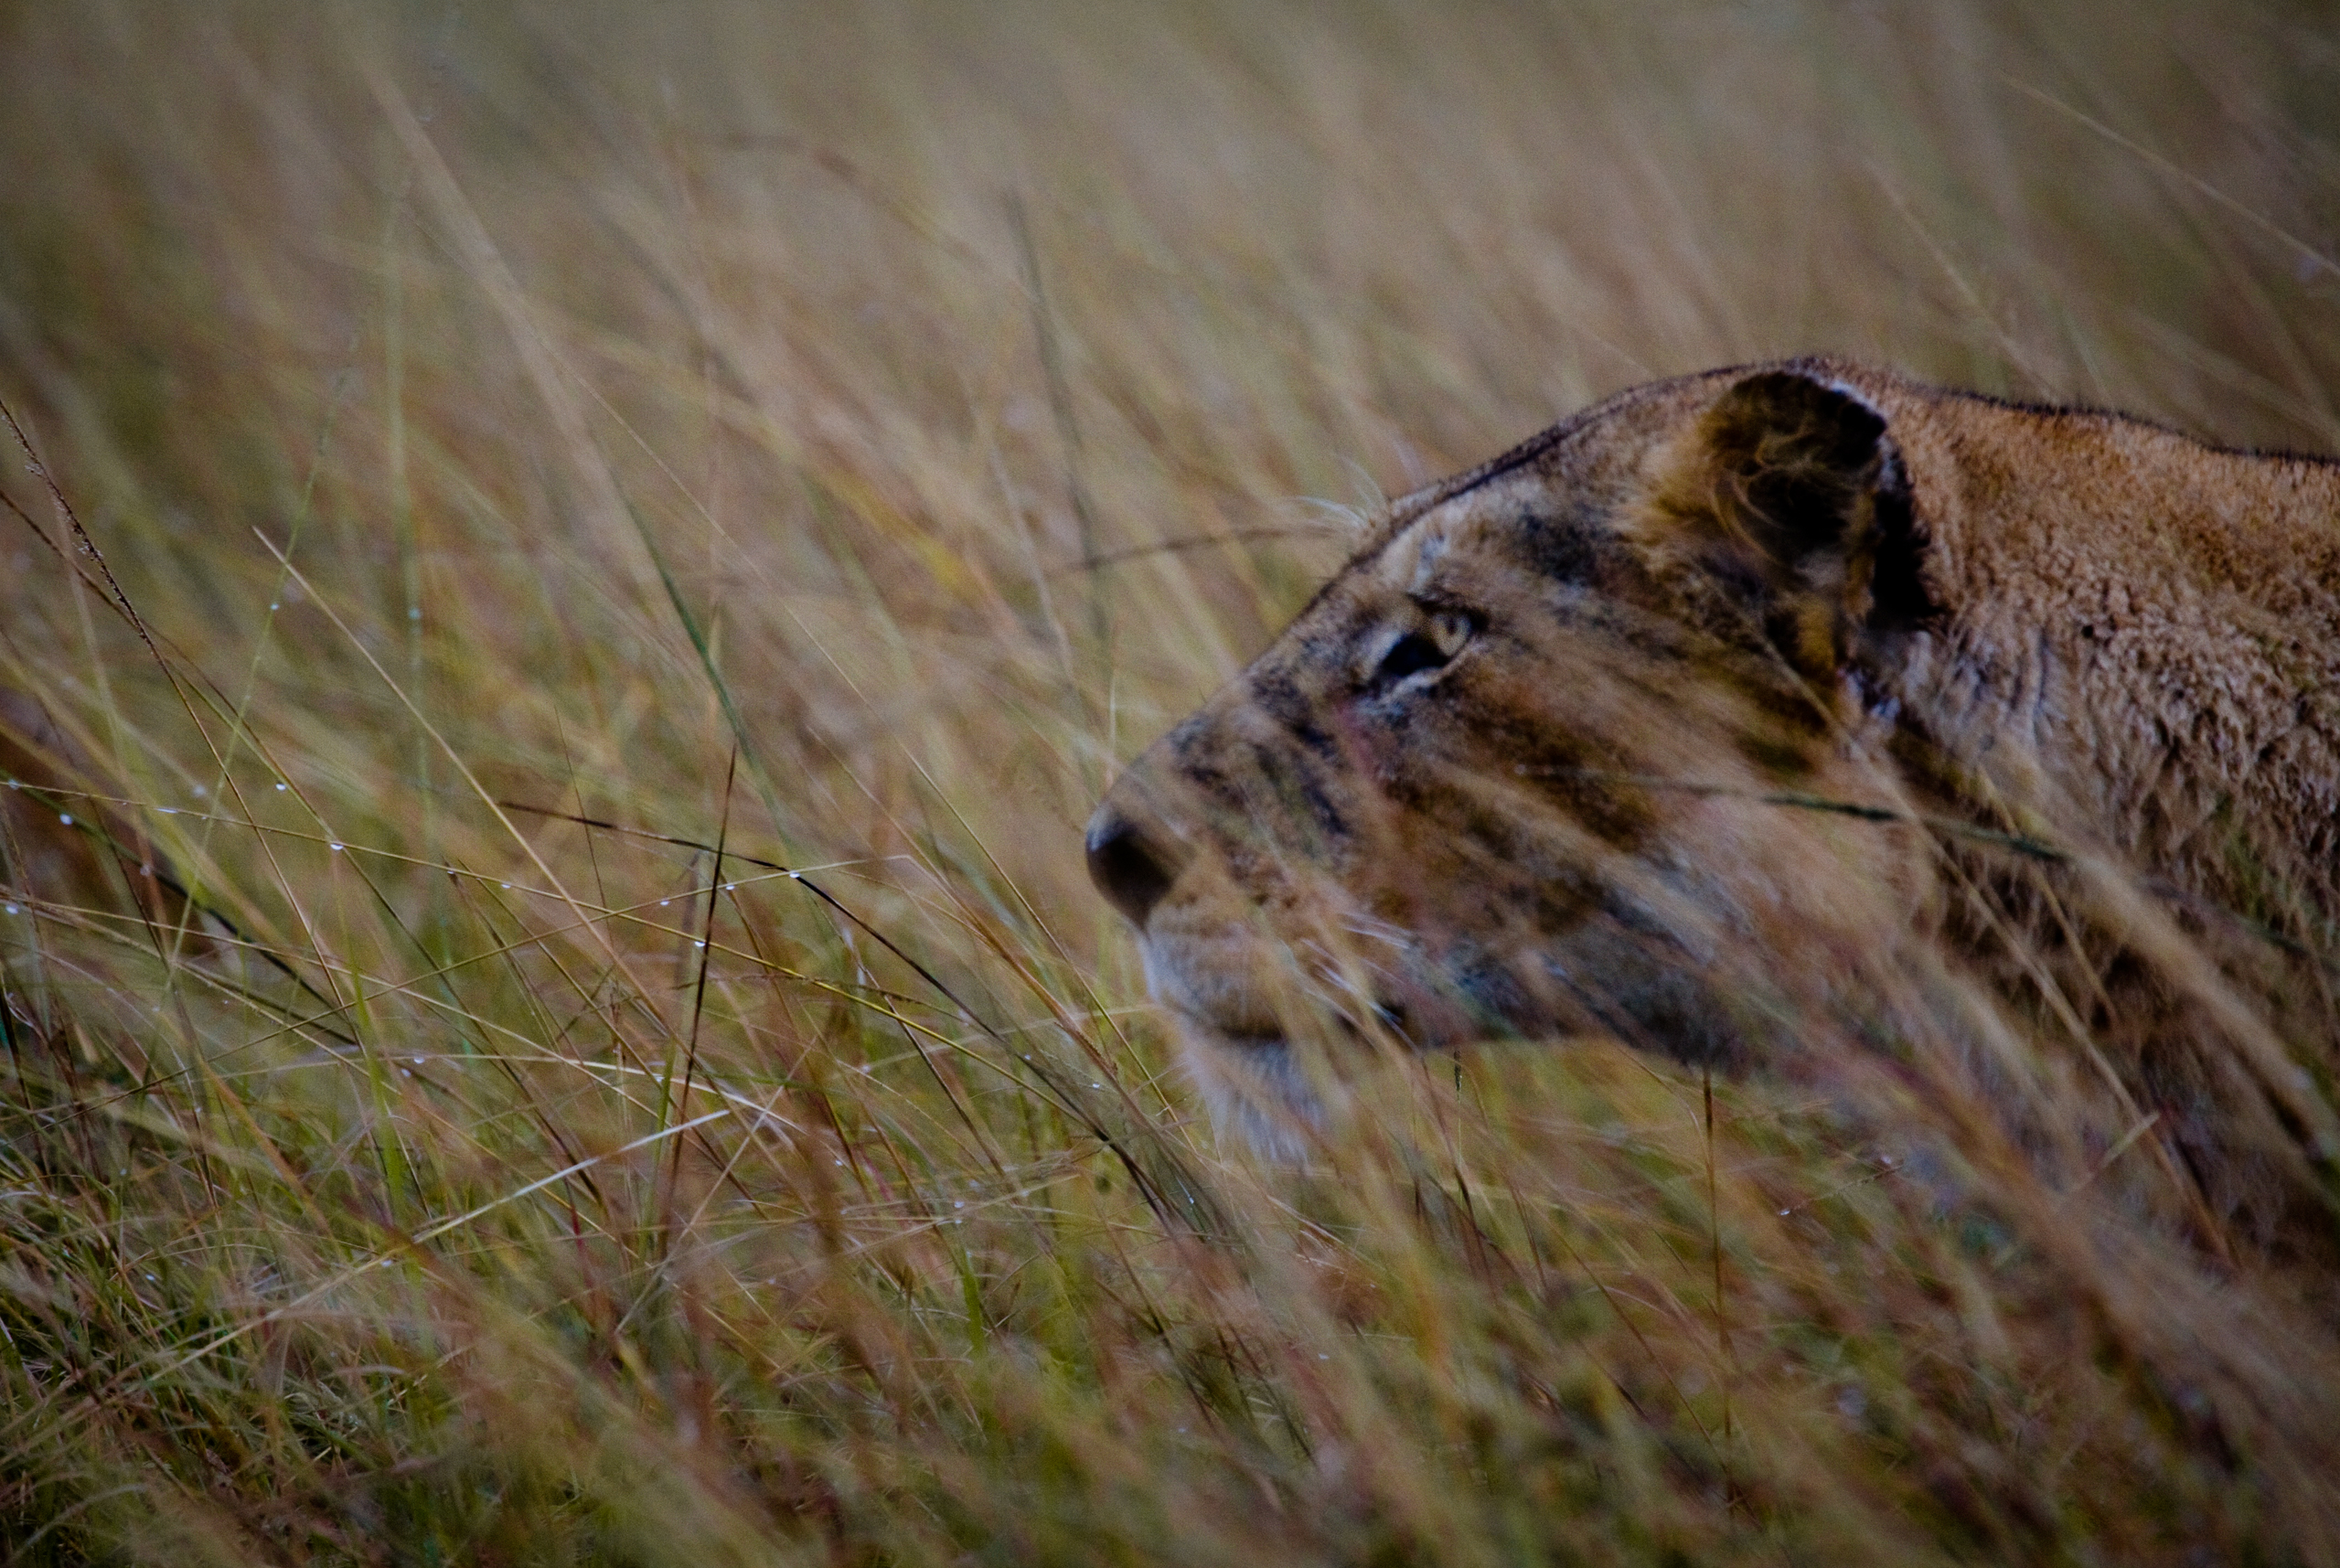 roaring_rain_lions_masai_mara_photo_by_flavio_oliva_20